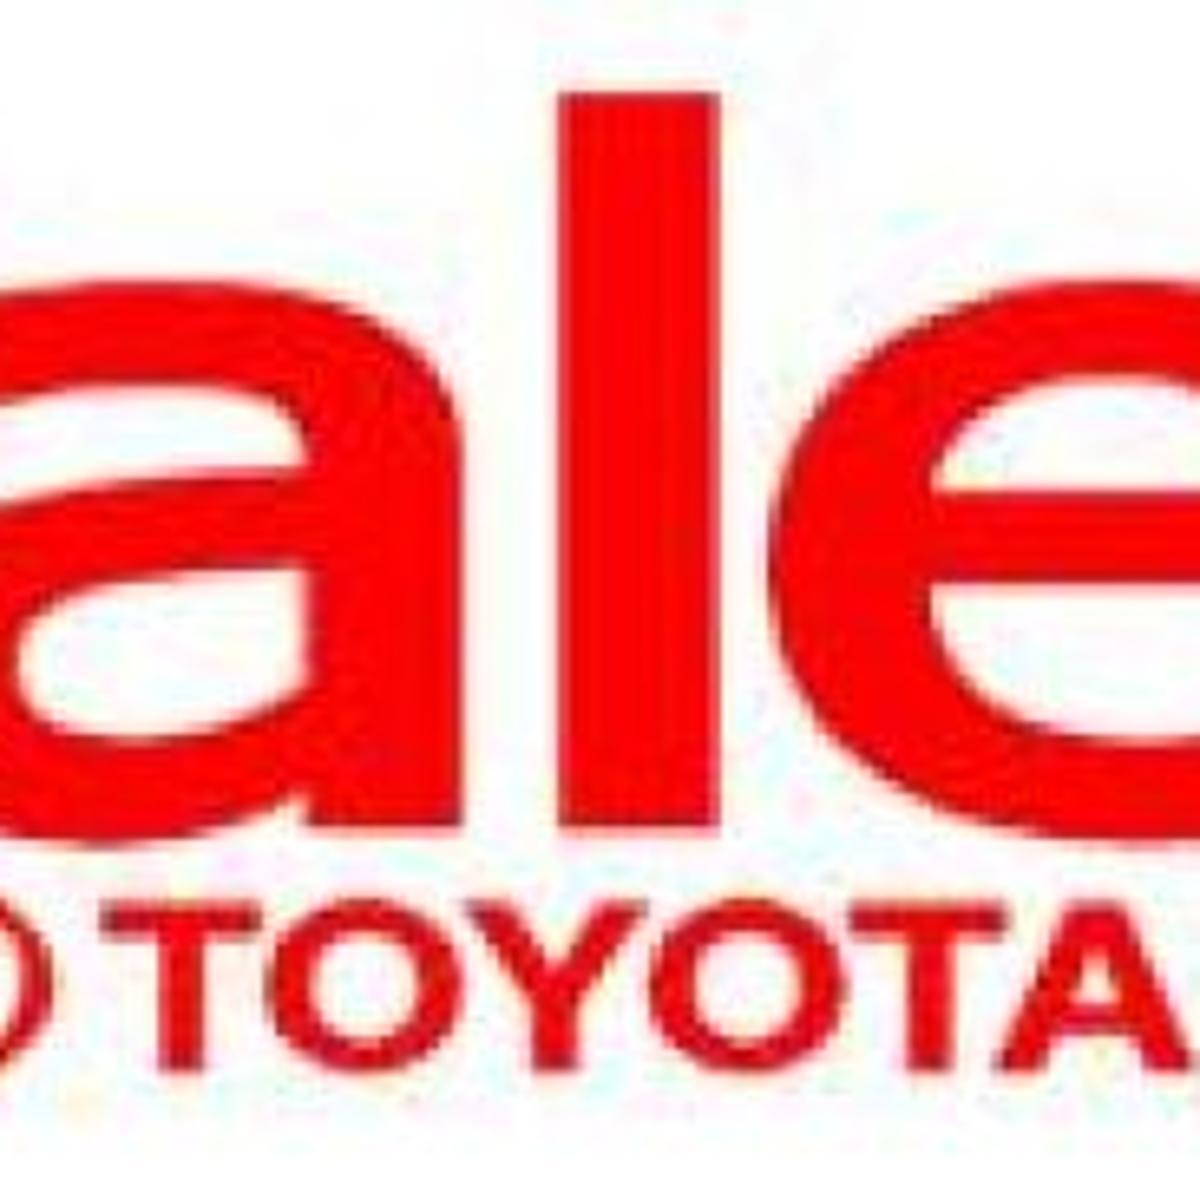 Haley Toyota Roanoke >> Storefront Work Begins On New Haley Toyota Dealership